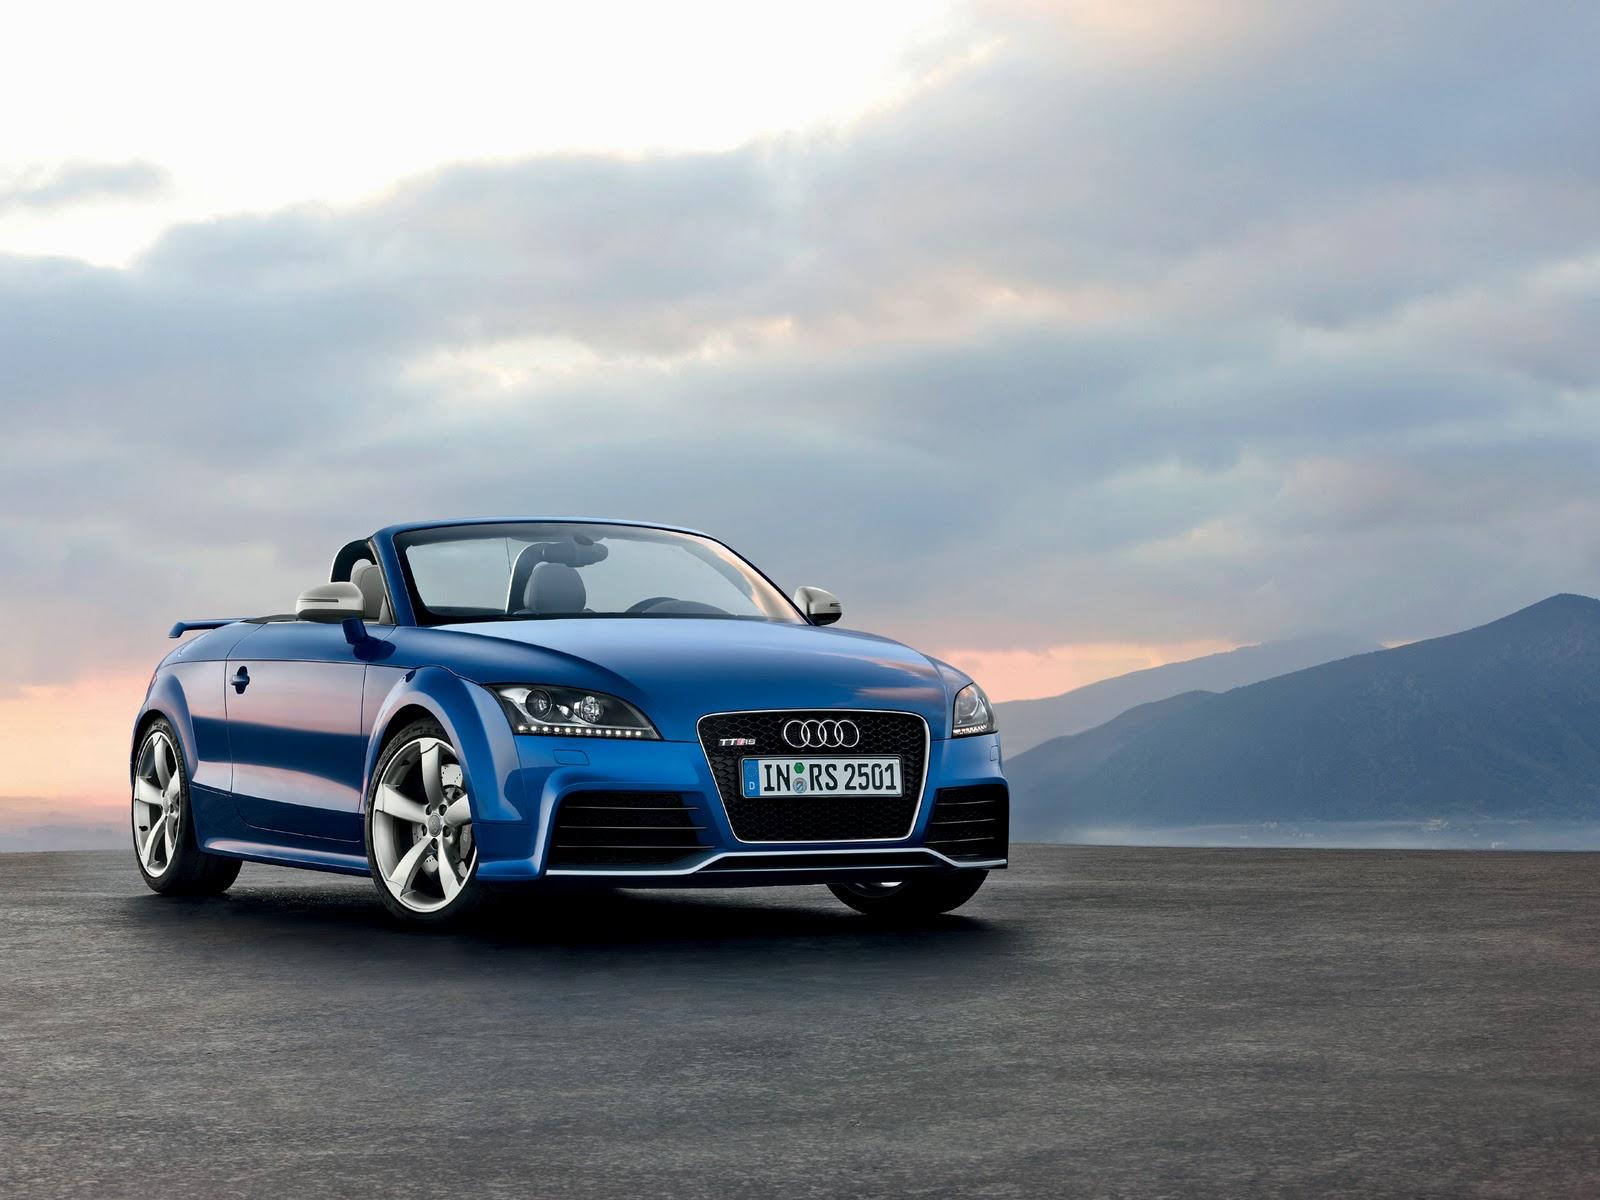 Audi Cars Full HD Wallpapers, Audi Cars Latest Wallpapers ...